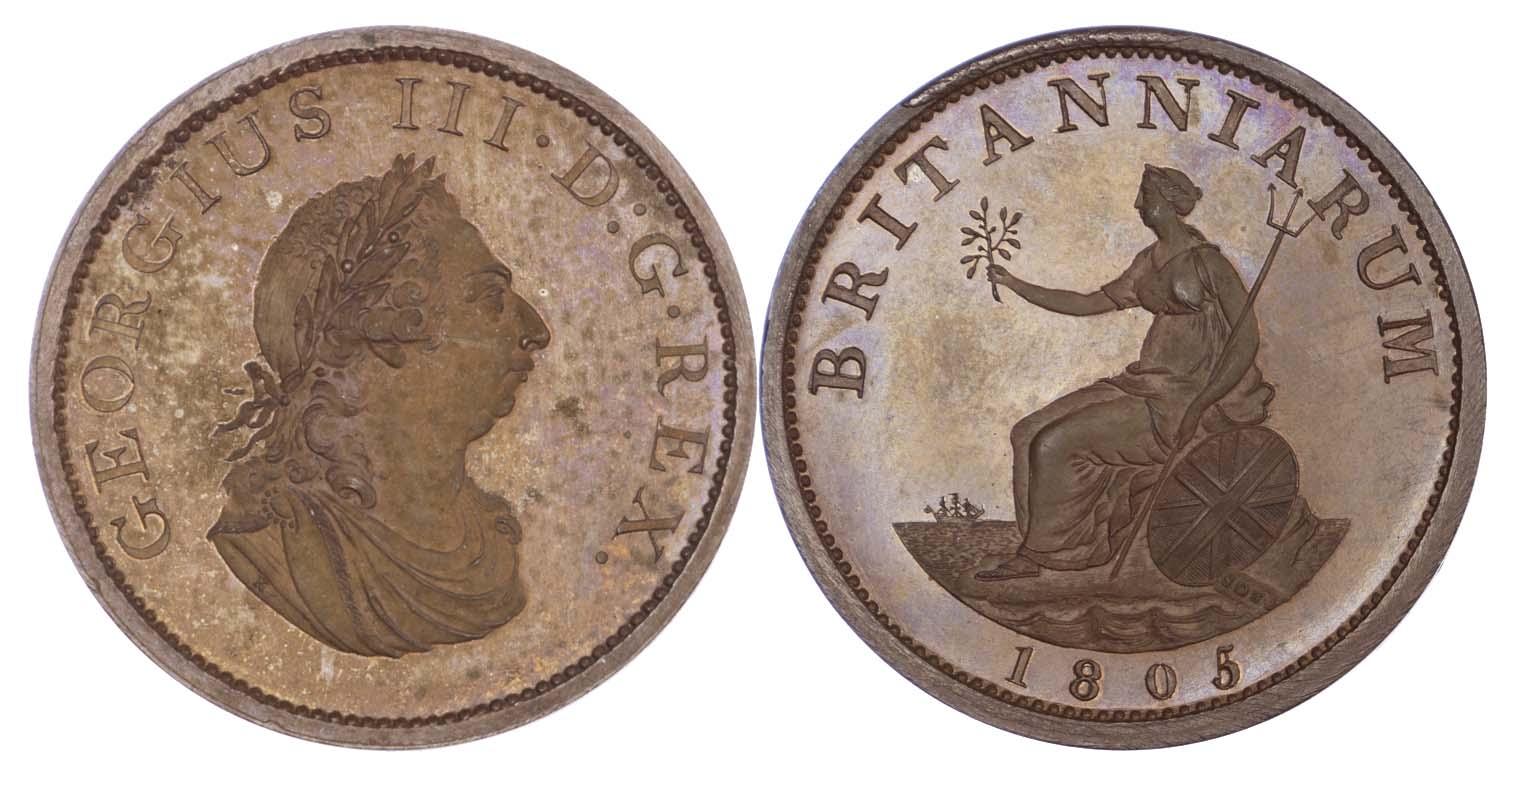 George III (1760-1820) Pattern Restrike Halfpenny, 1805 (BMC.1309)